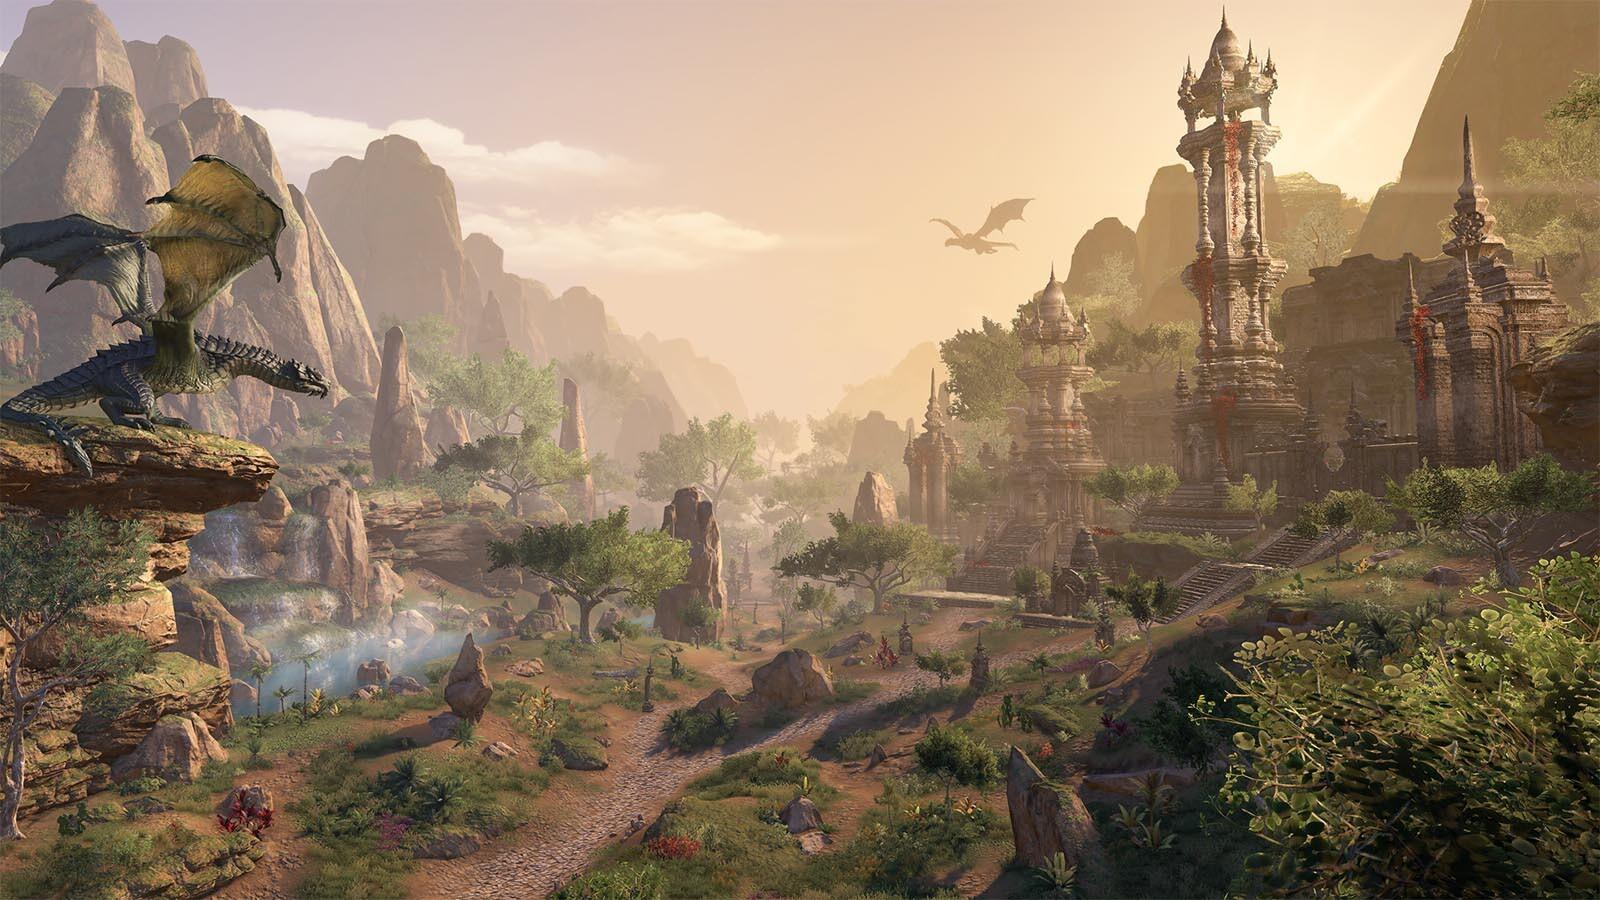 The Elder Scrolls Online: Elsweyr [Zenimax Online CD Key] for PC and Mac -  Buy now